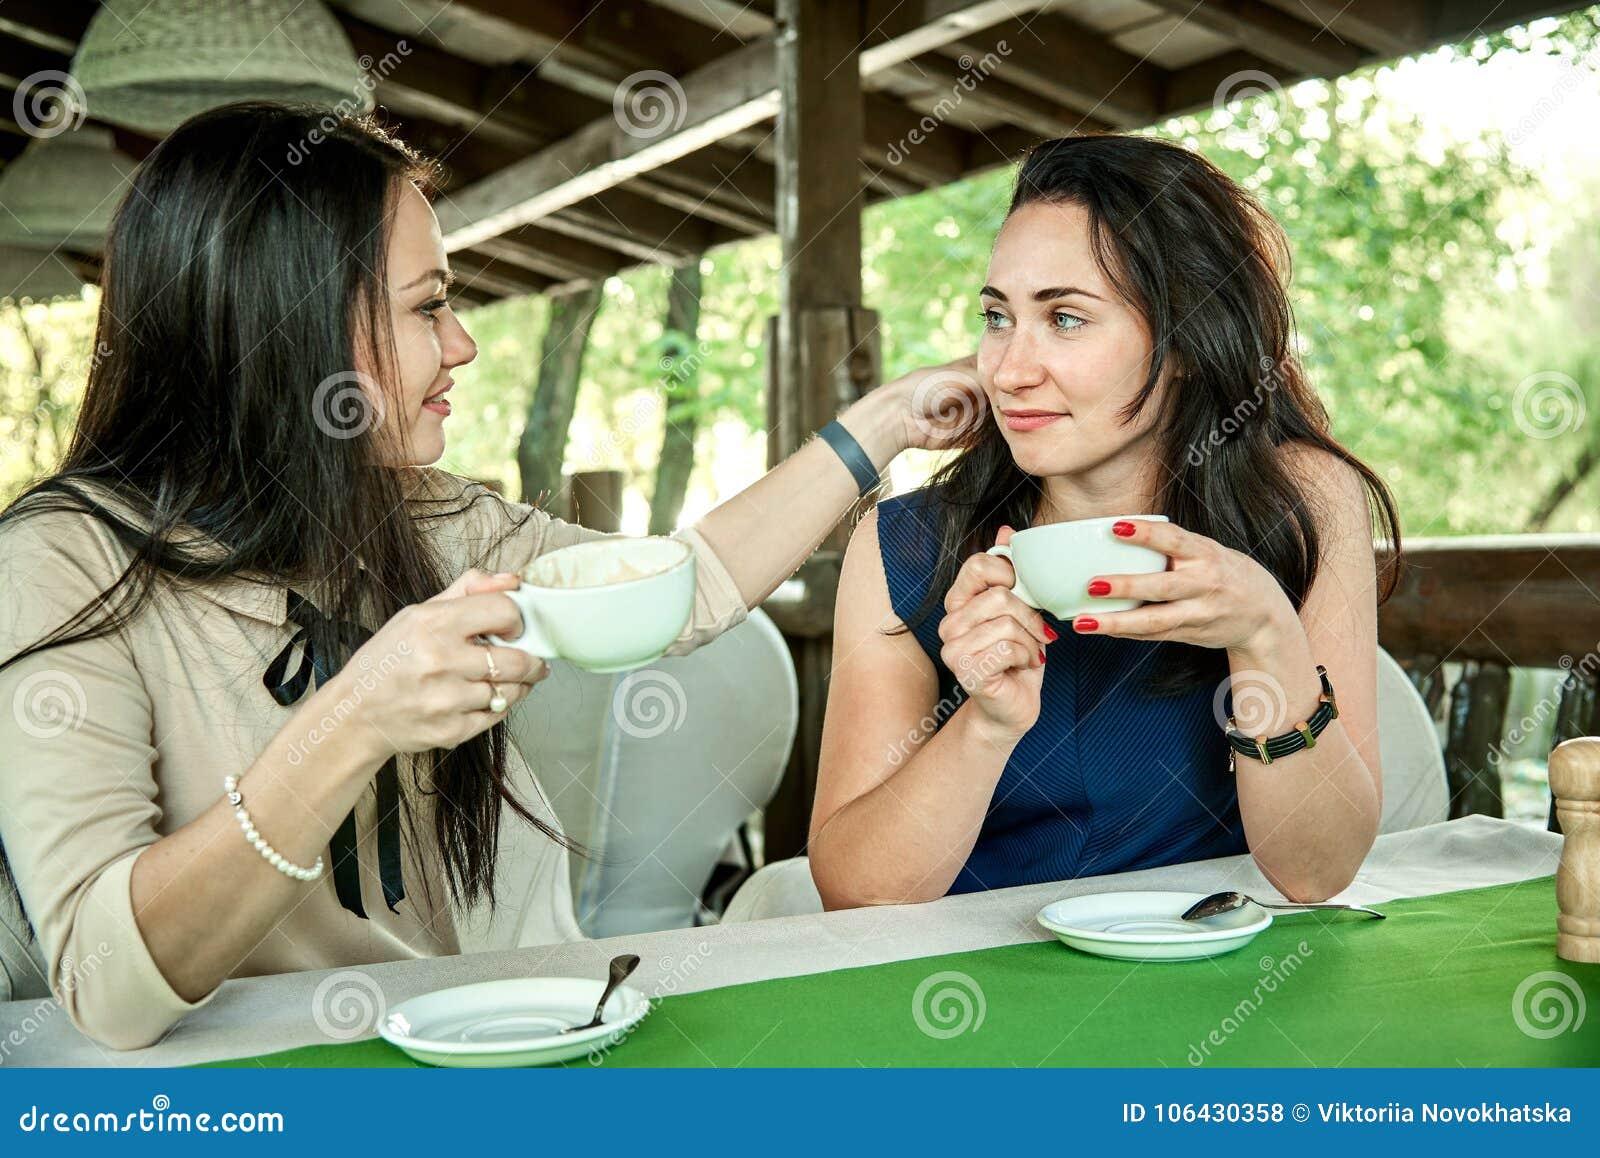 young girls flirting